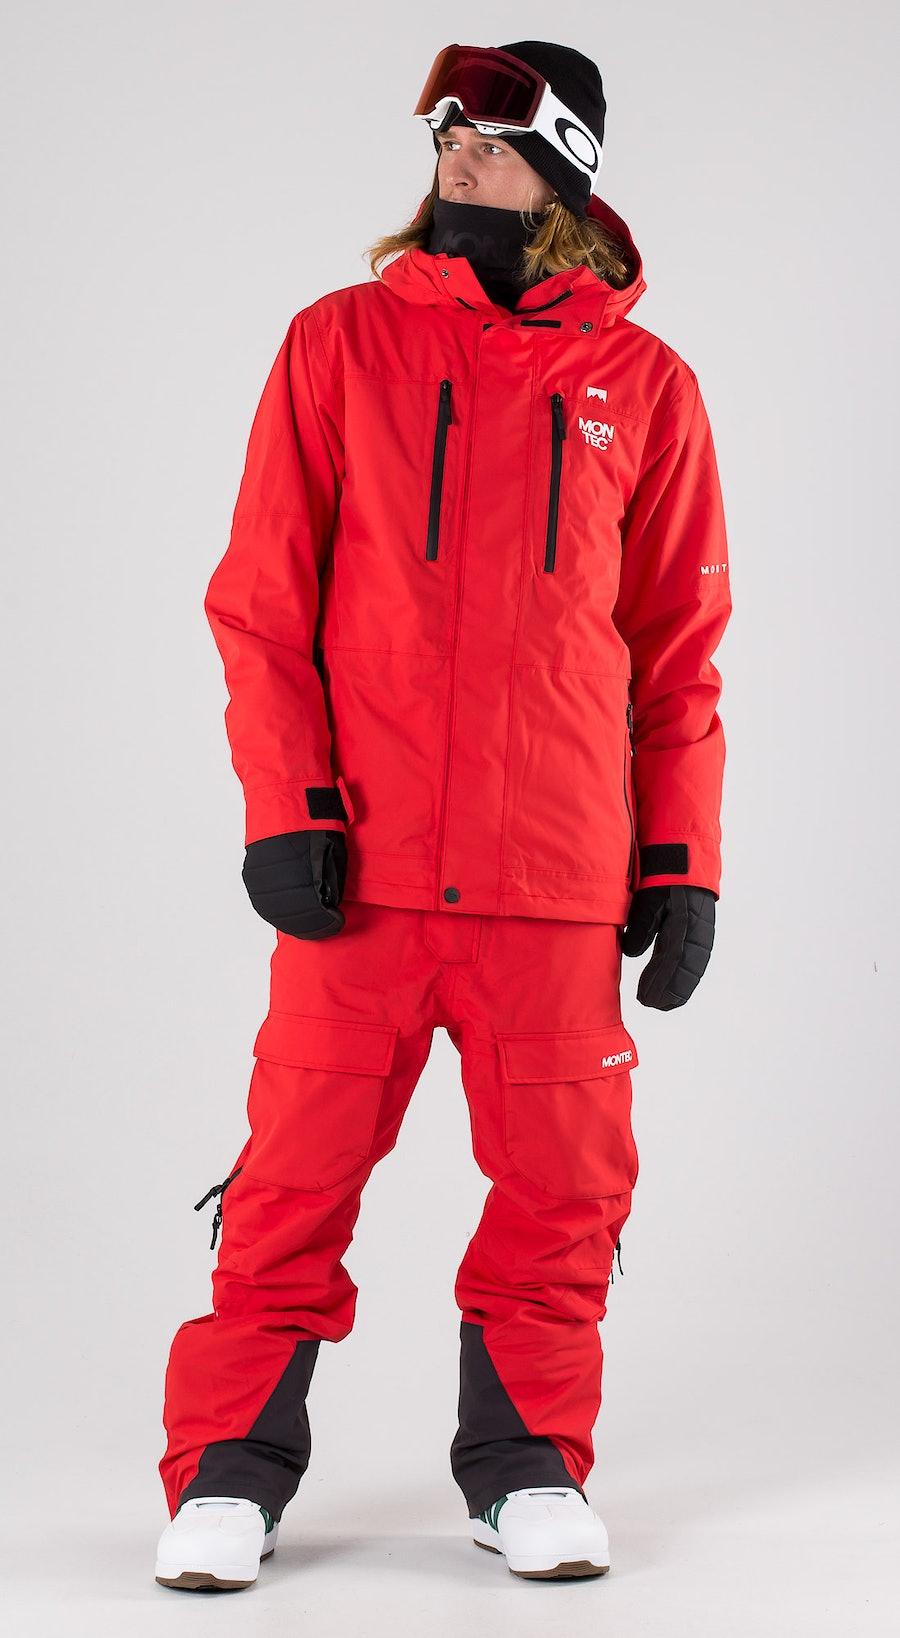 Montec Fawk Red Snowboardkläder Multi